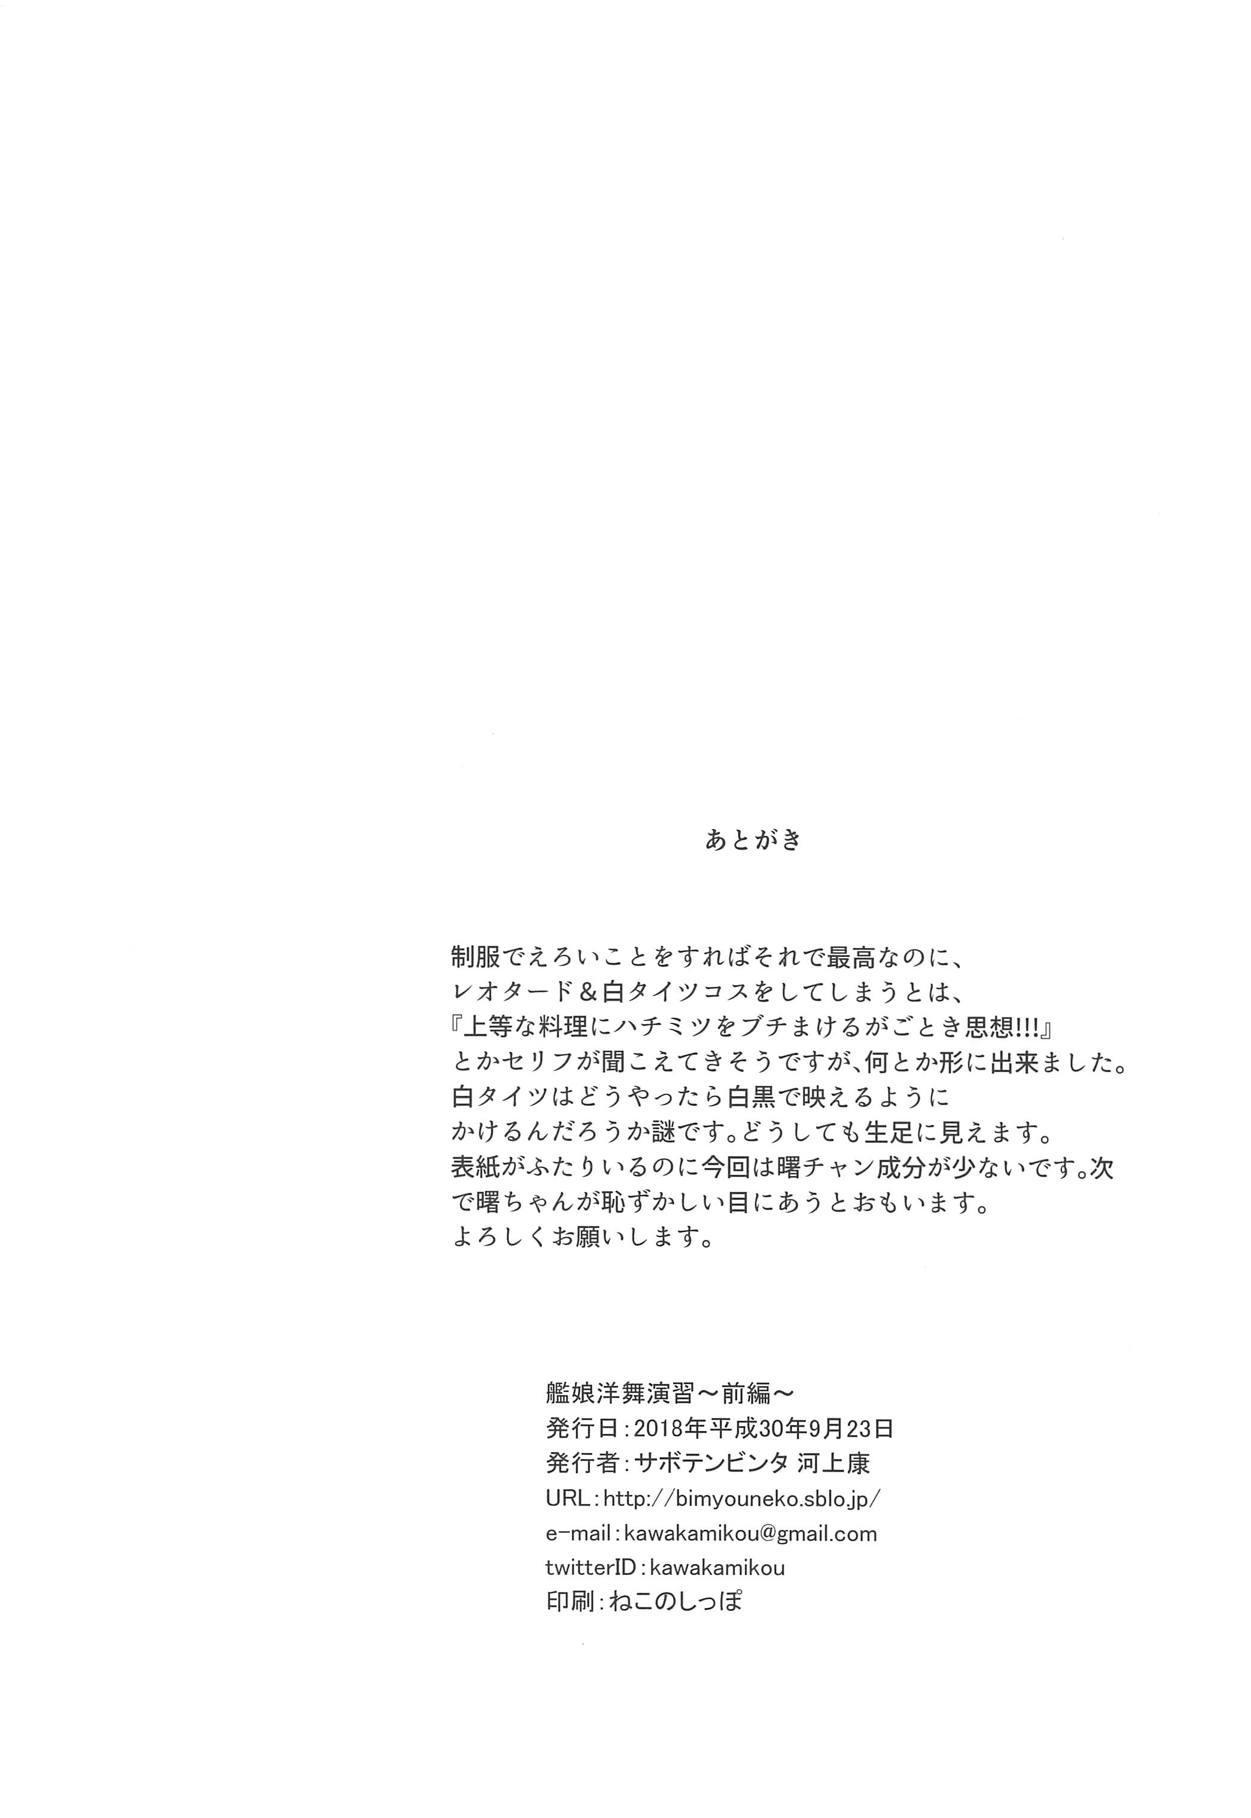 Kanmusu Youbu Enshuu 32